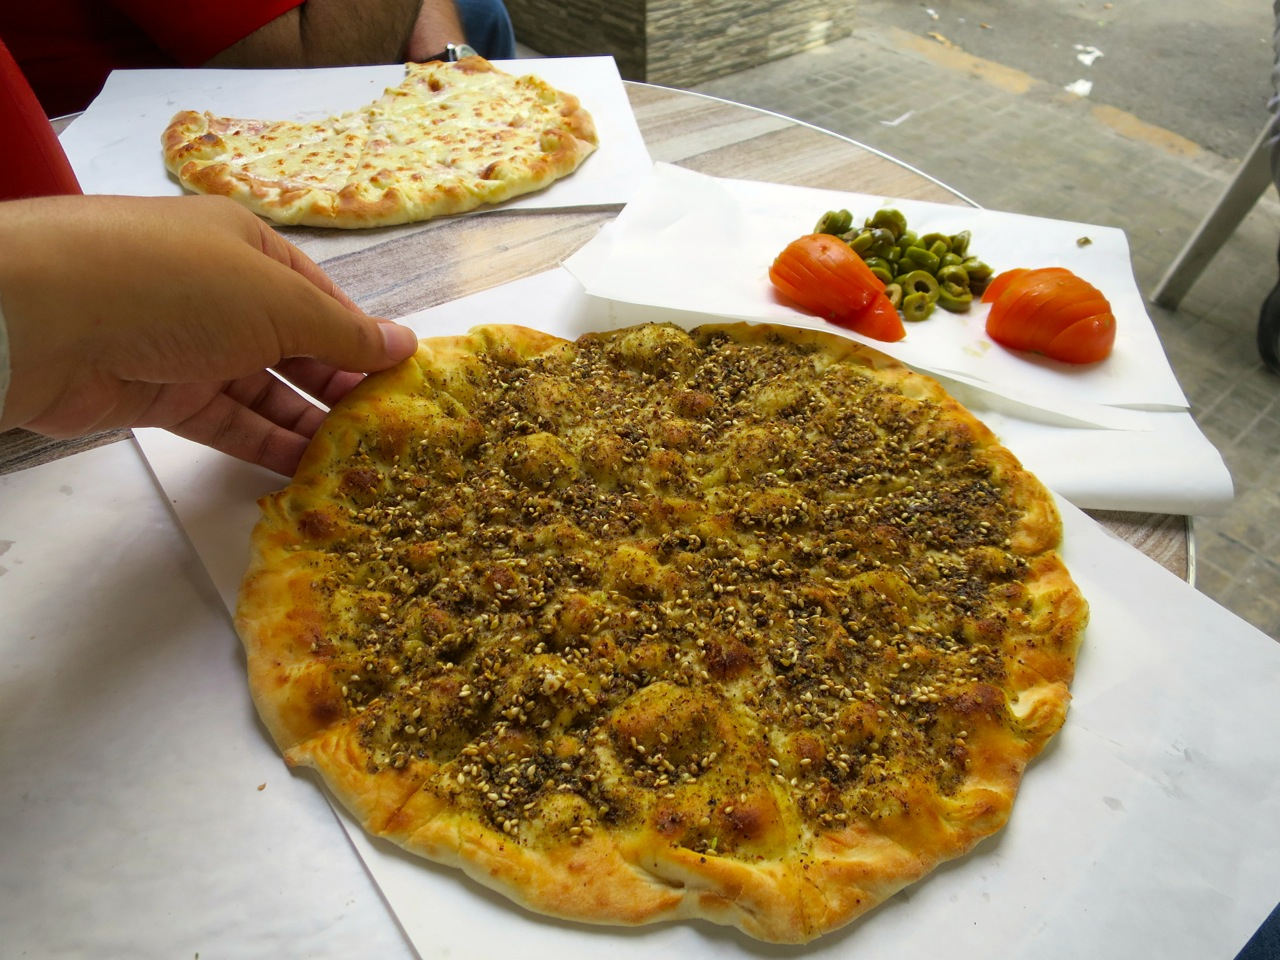 Comida árabe 1-06